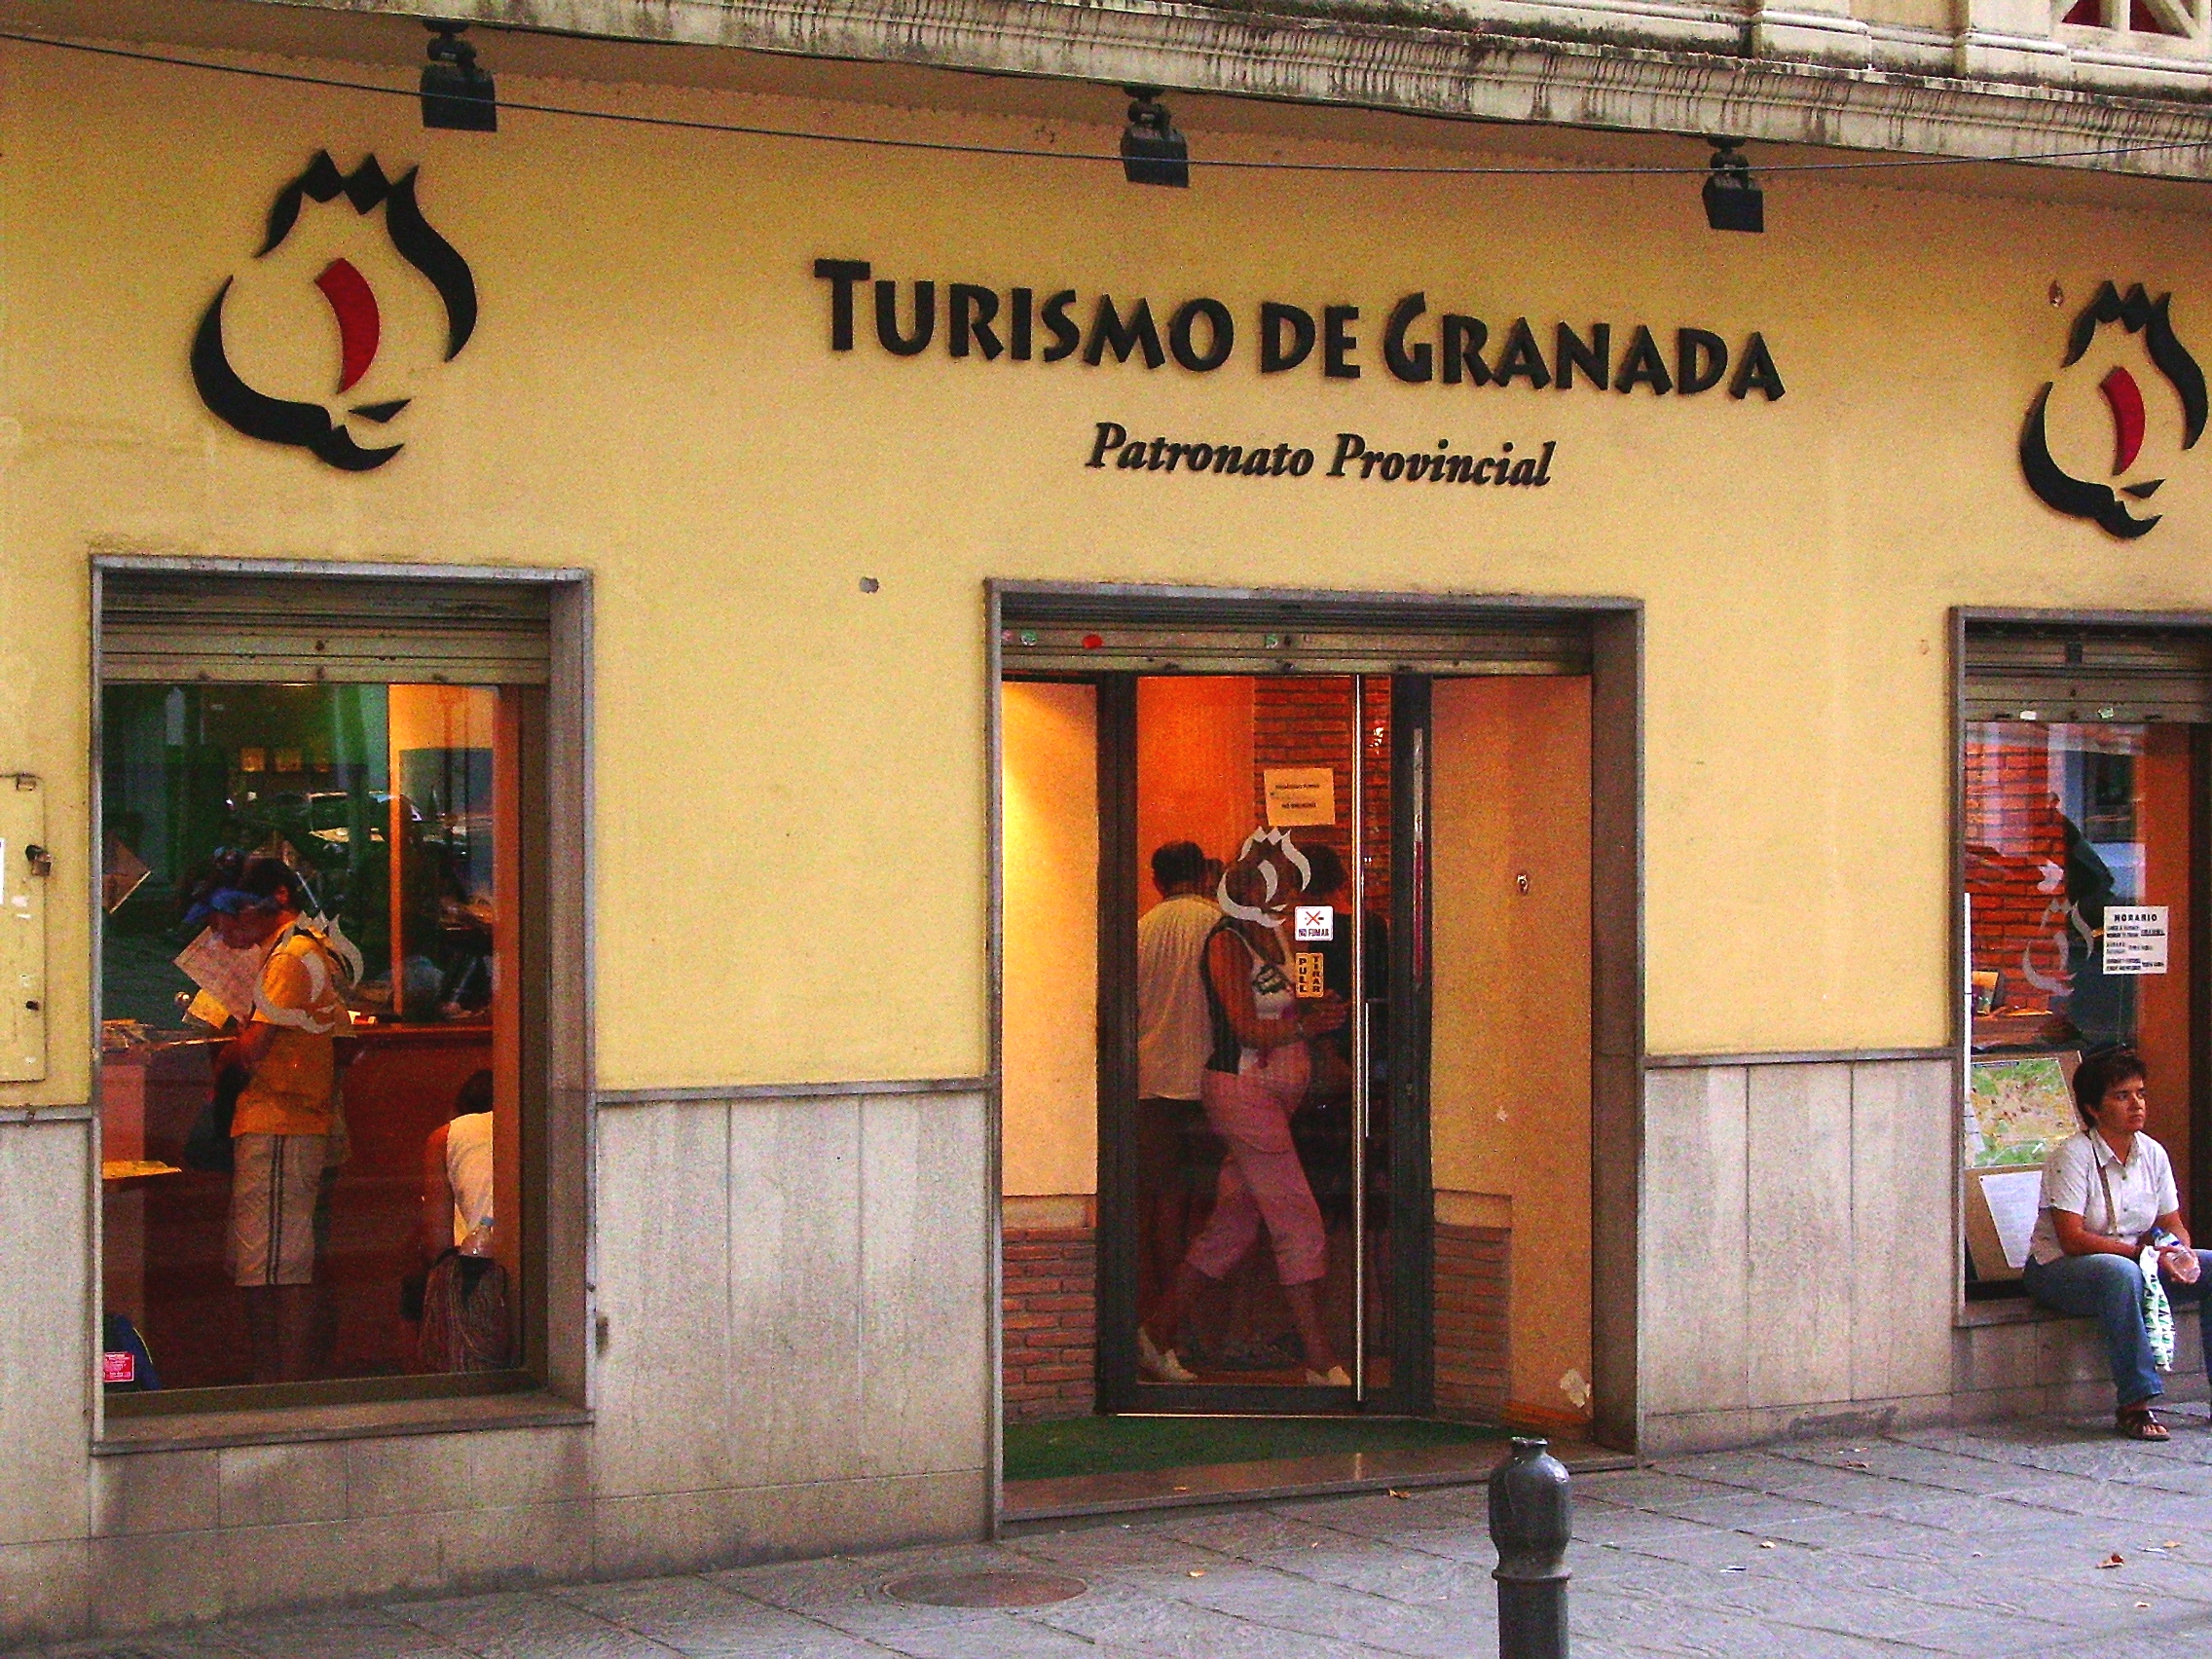 Oficina del patronato provincial de turismo for Oficina de turismo benasque